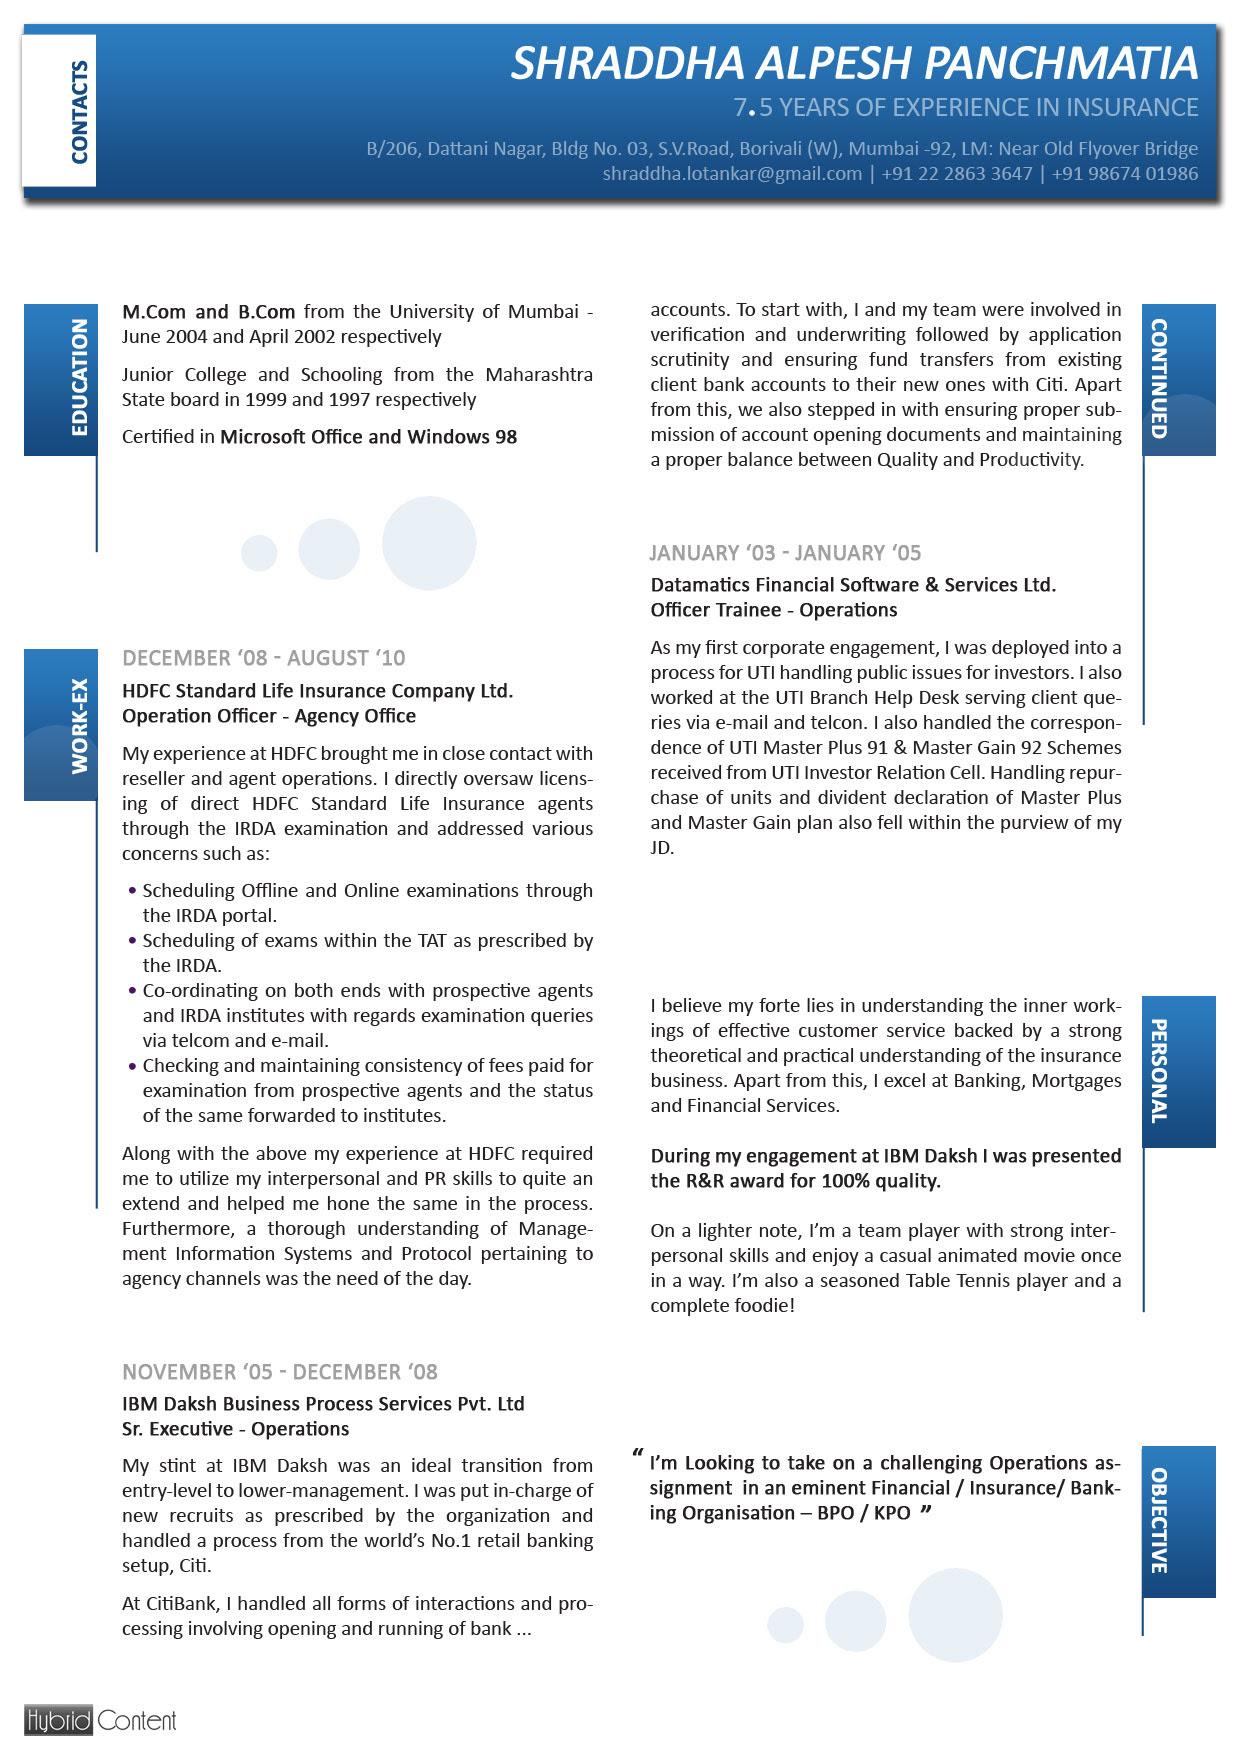 Resumescv Resume Cv And Biodata